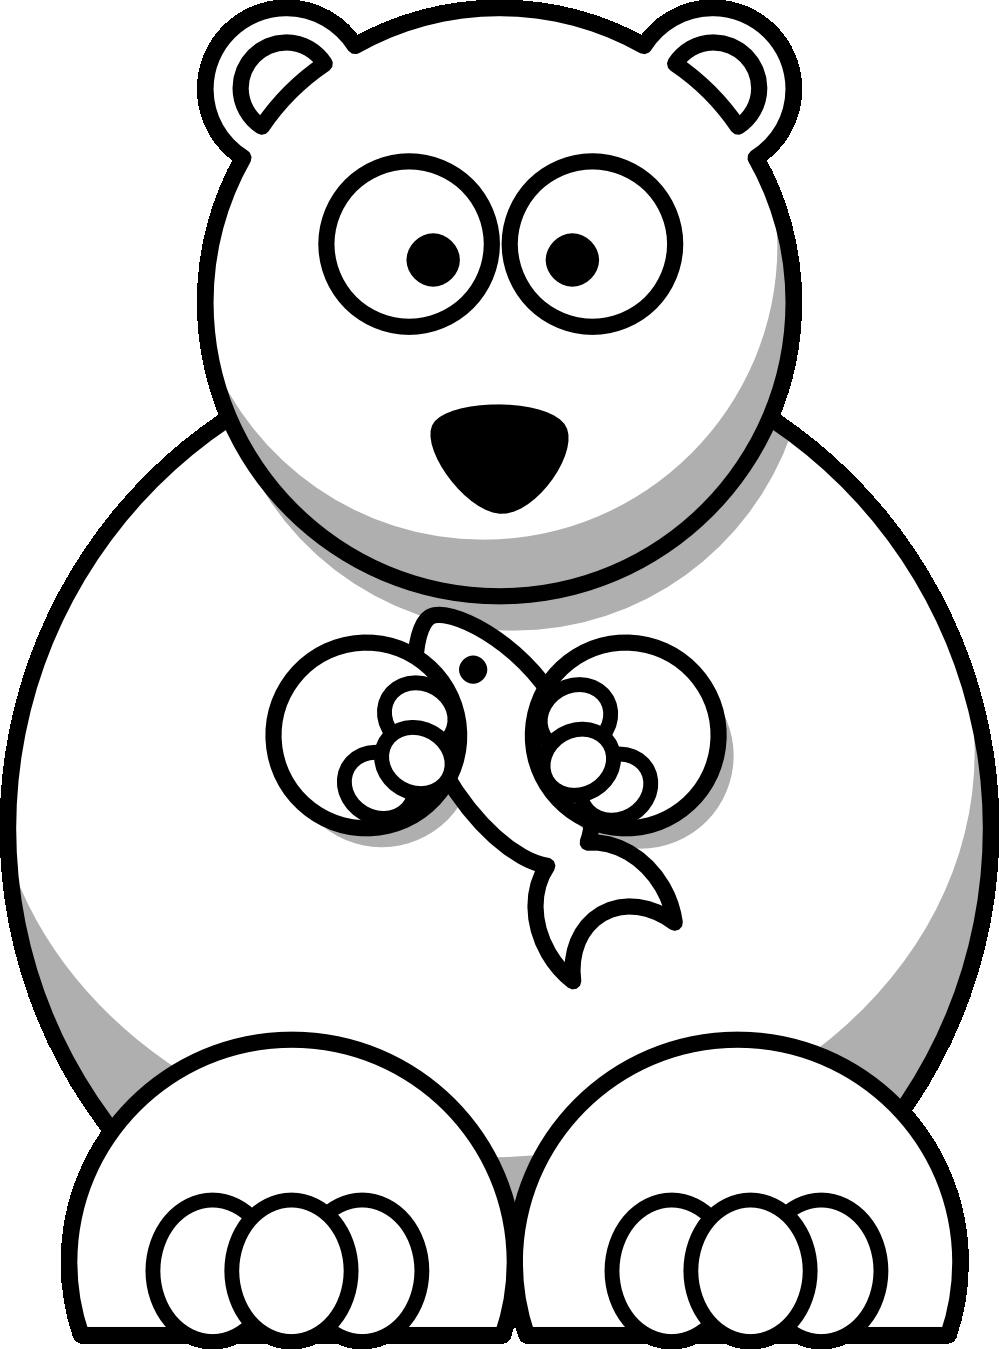 banner transparent download Clip art panda free. Polar bear black and white clipart